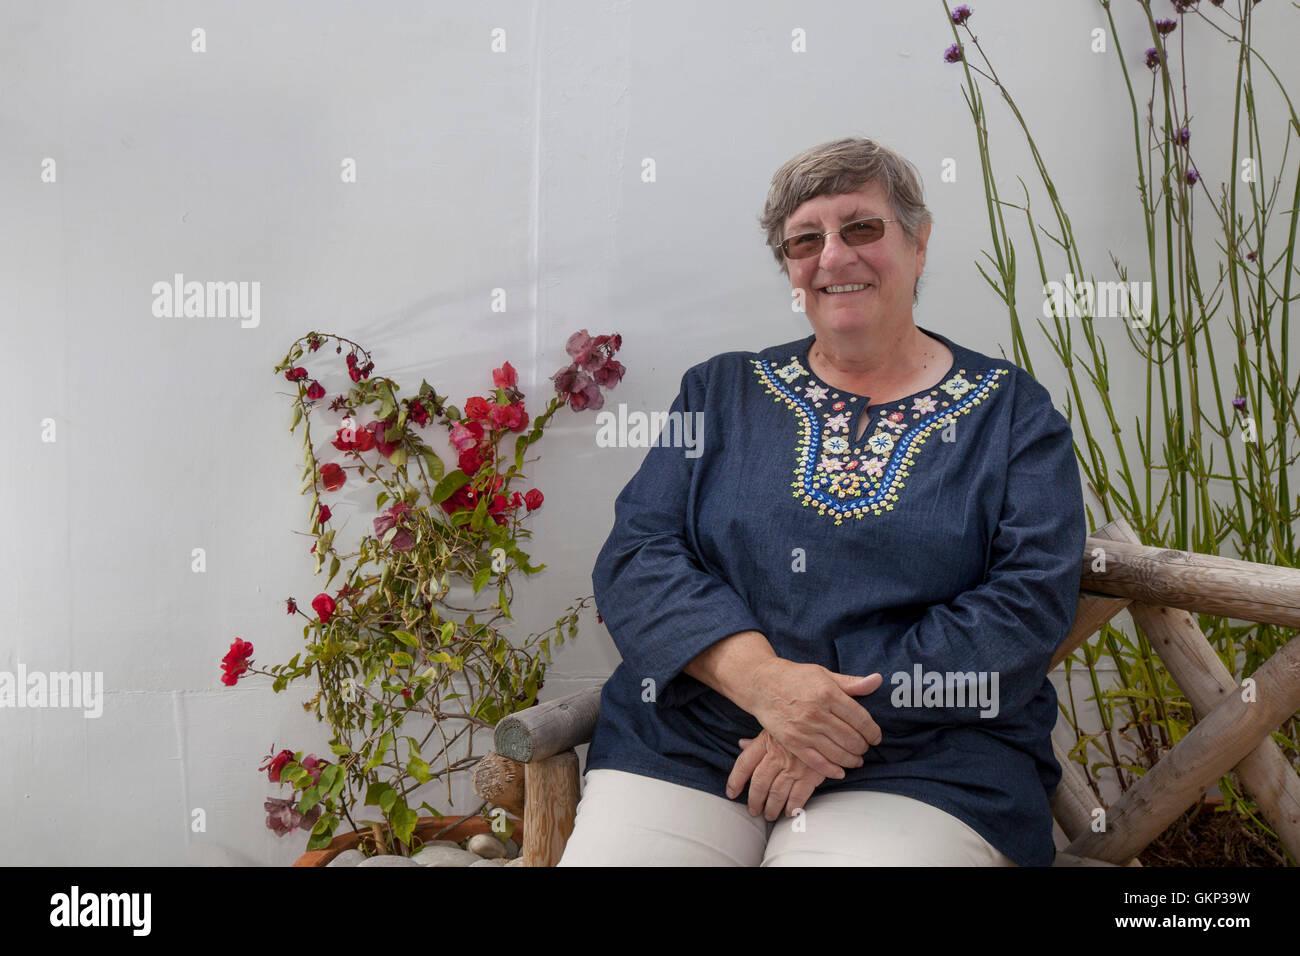 Southport, Merseyside, UK.  21st Aug, 2016.  Renowned horticulturist and TV celebrity gardener Christine Walkden, - Stock Image